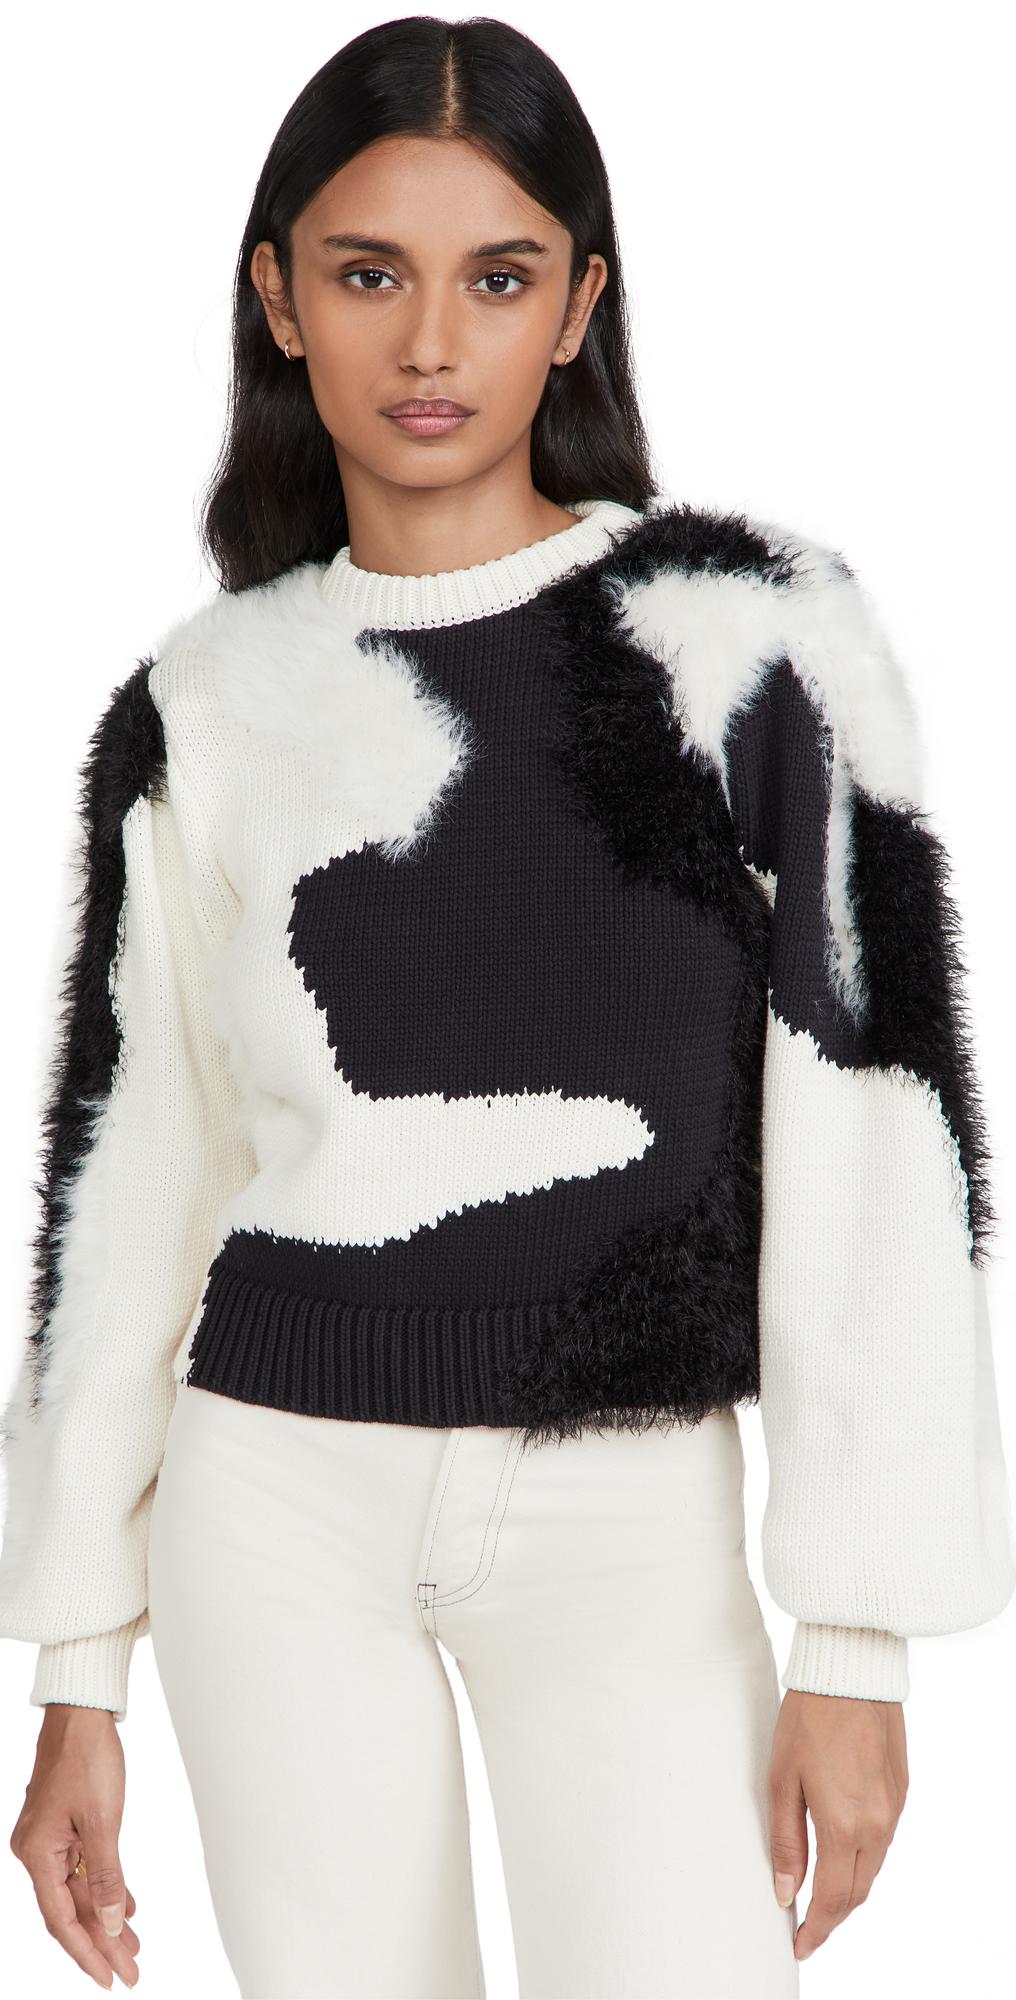 Dominique Knit Sweater